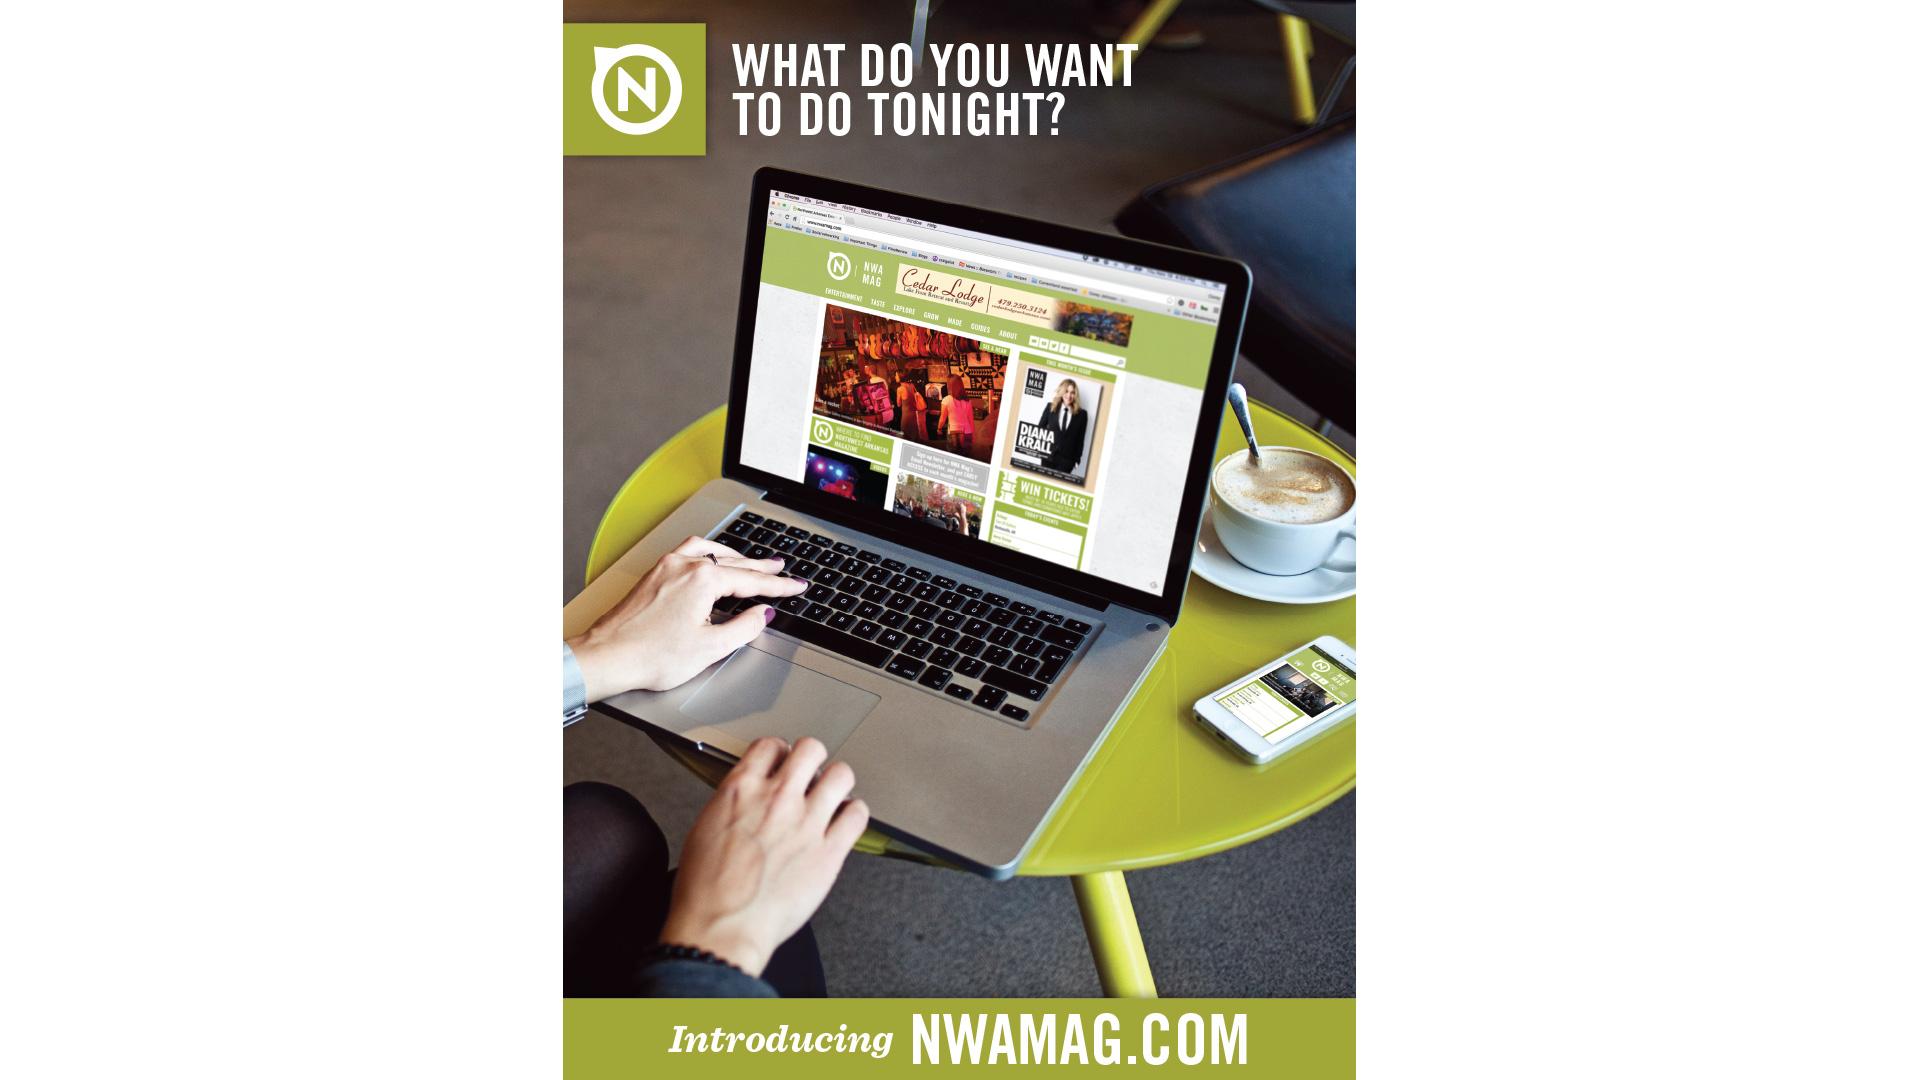 NWA_WebLaunch.jpg